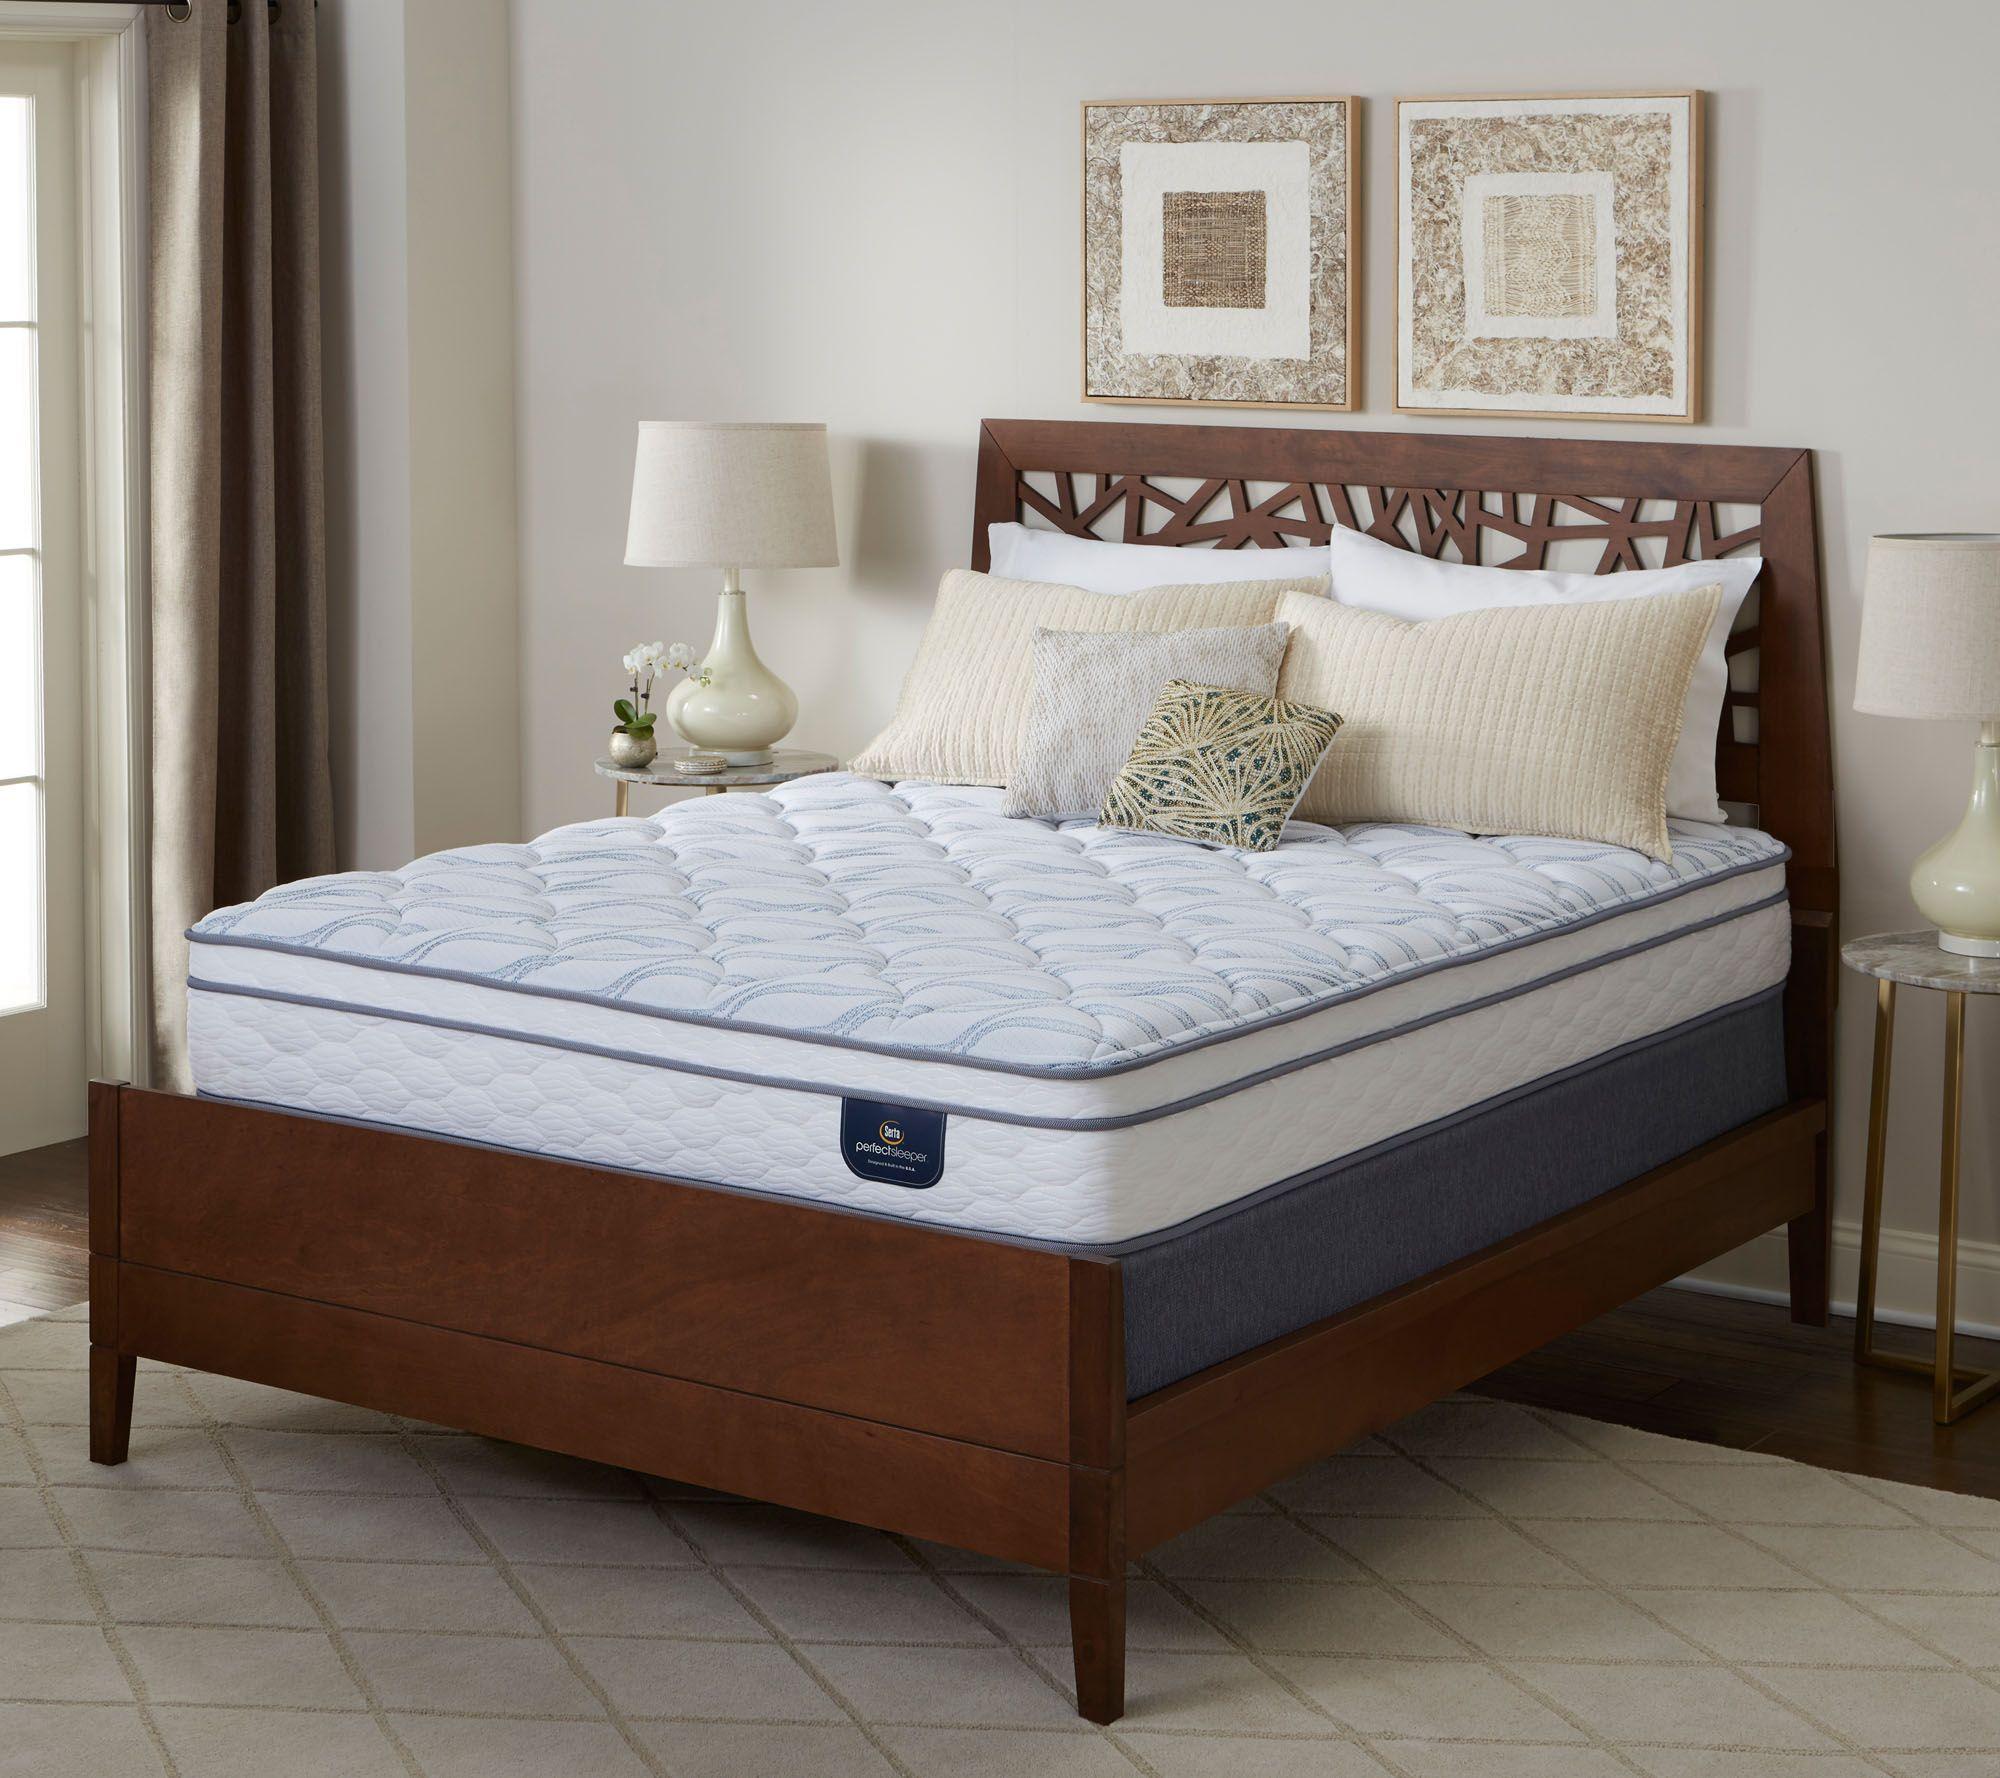 Serta Perfect Sleeper Carmine Euro Top King Mattress Set H291982